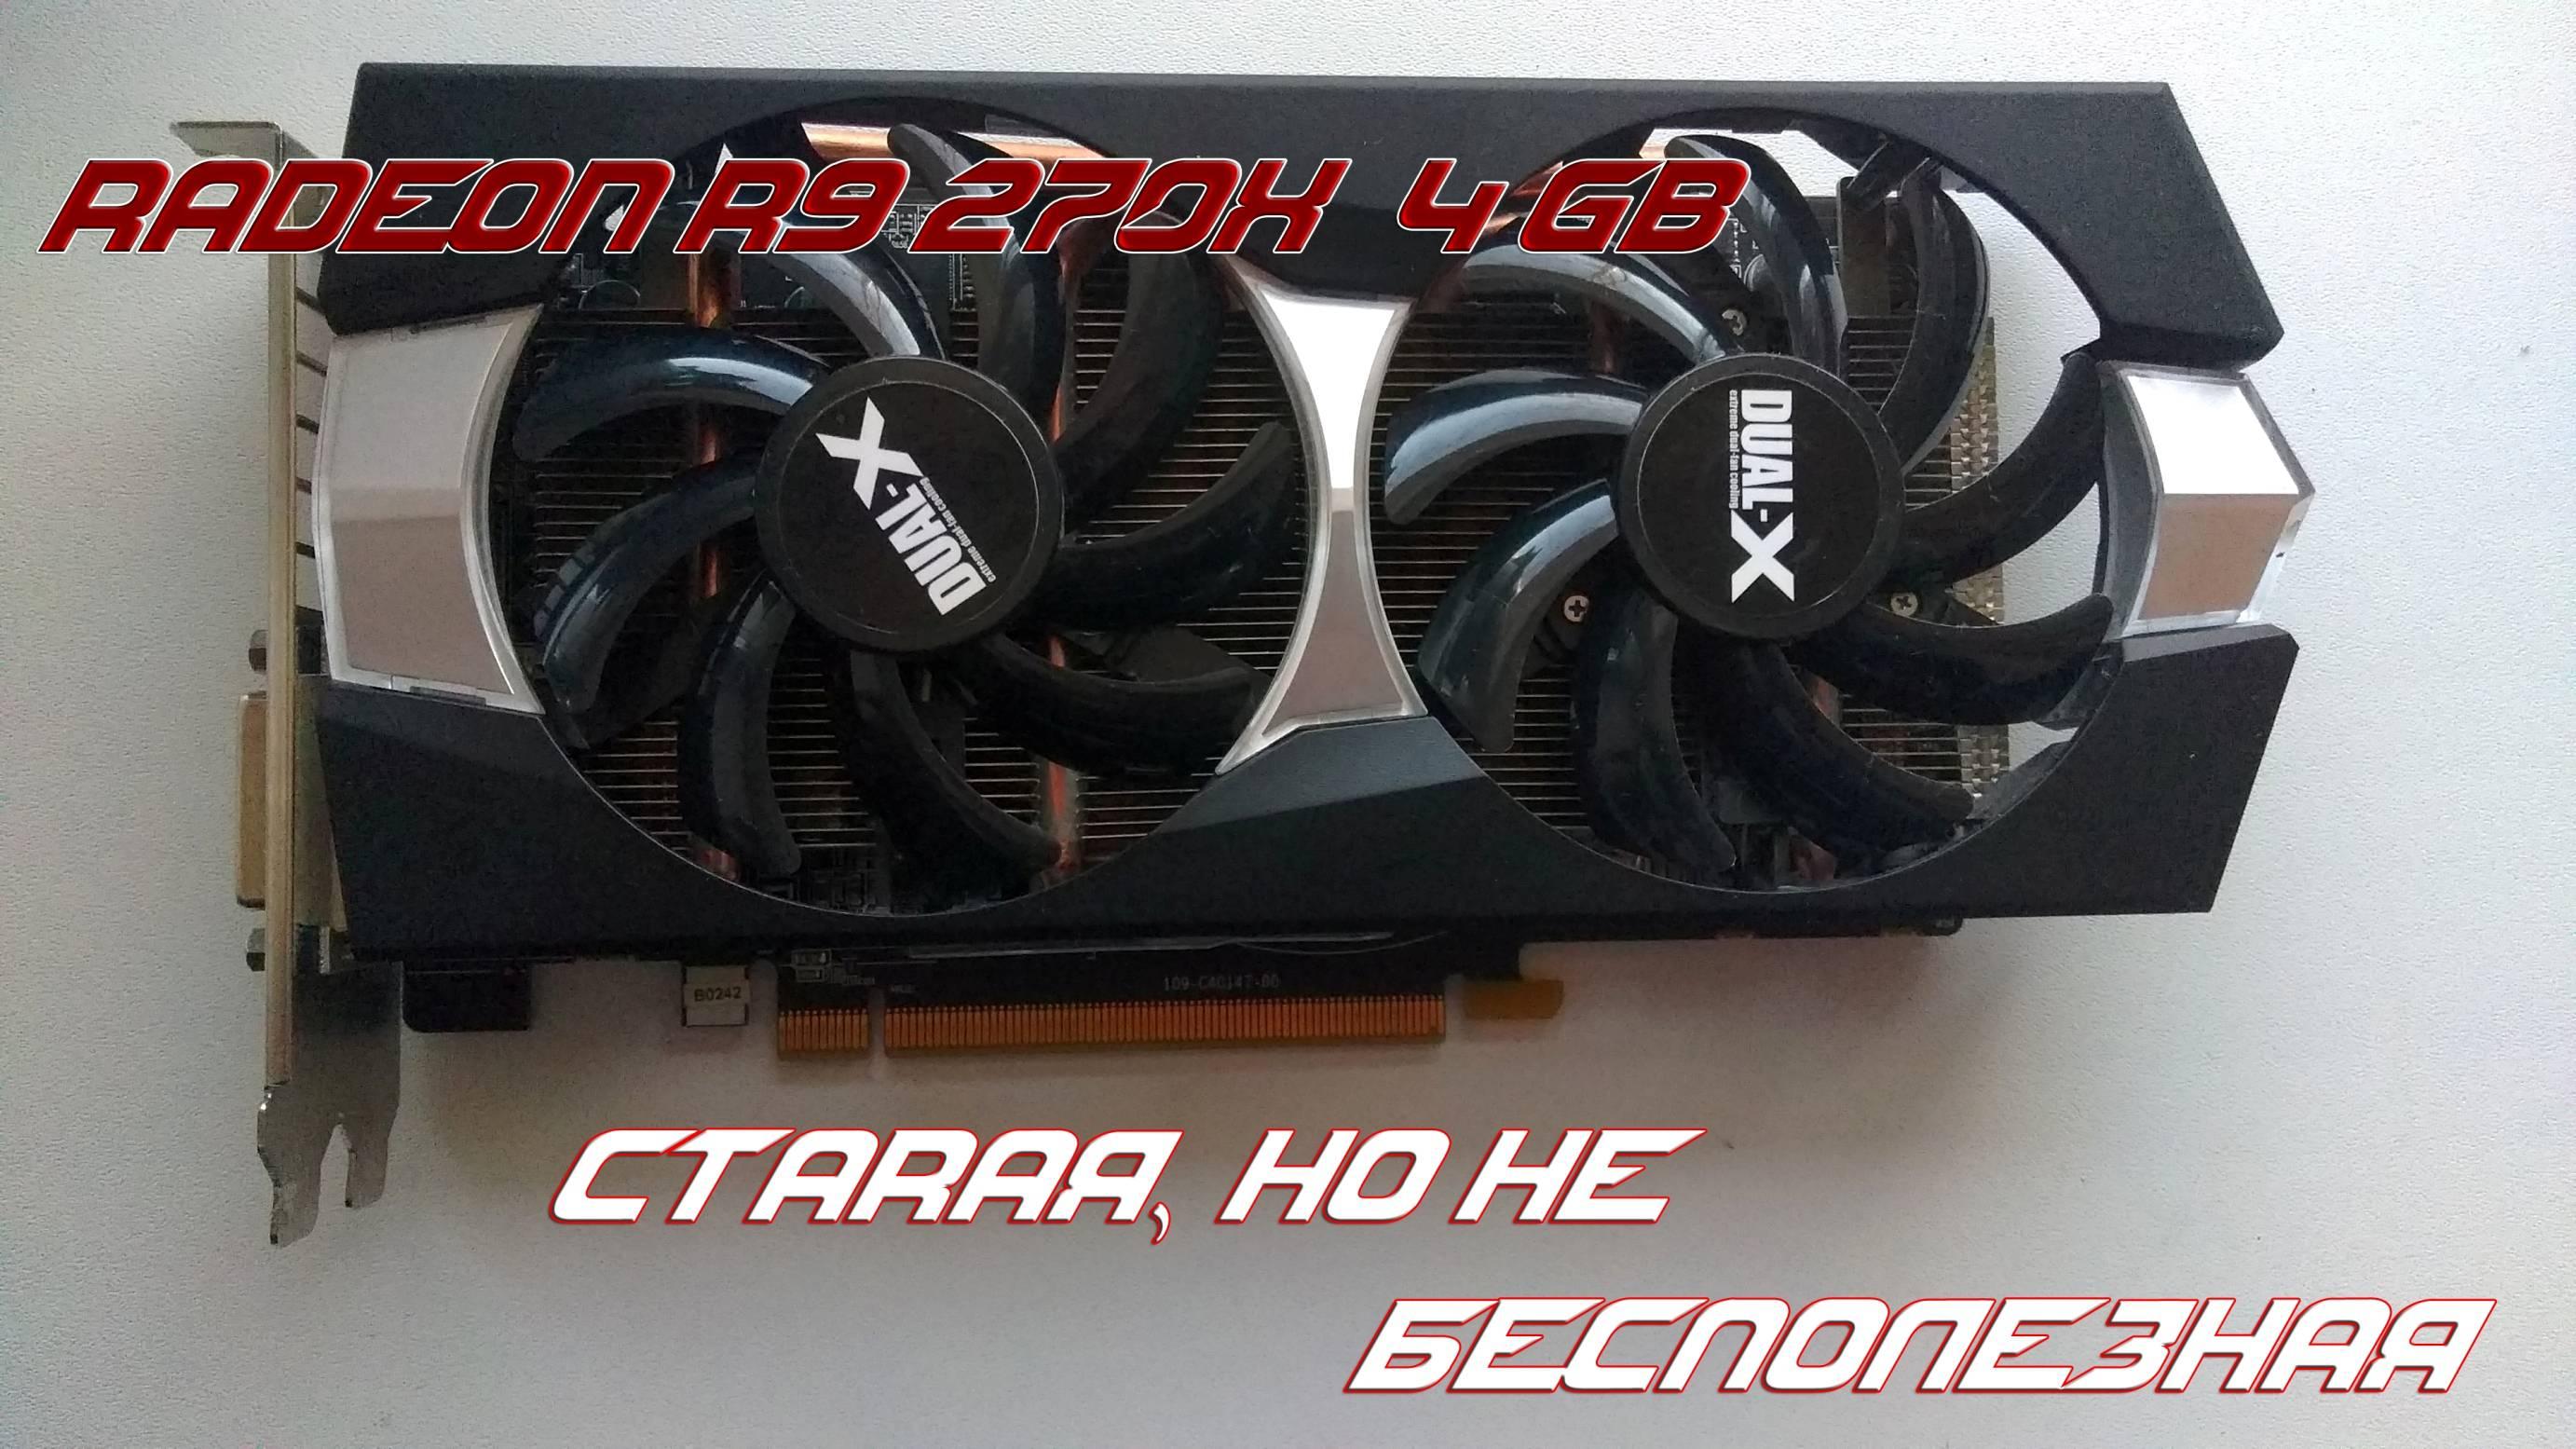 AMD RADEON R9 270X 4GB - Видеокарта из прошлого, бьющая рекорды